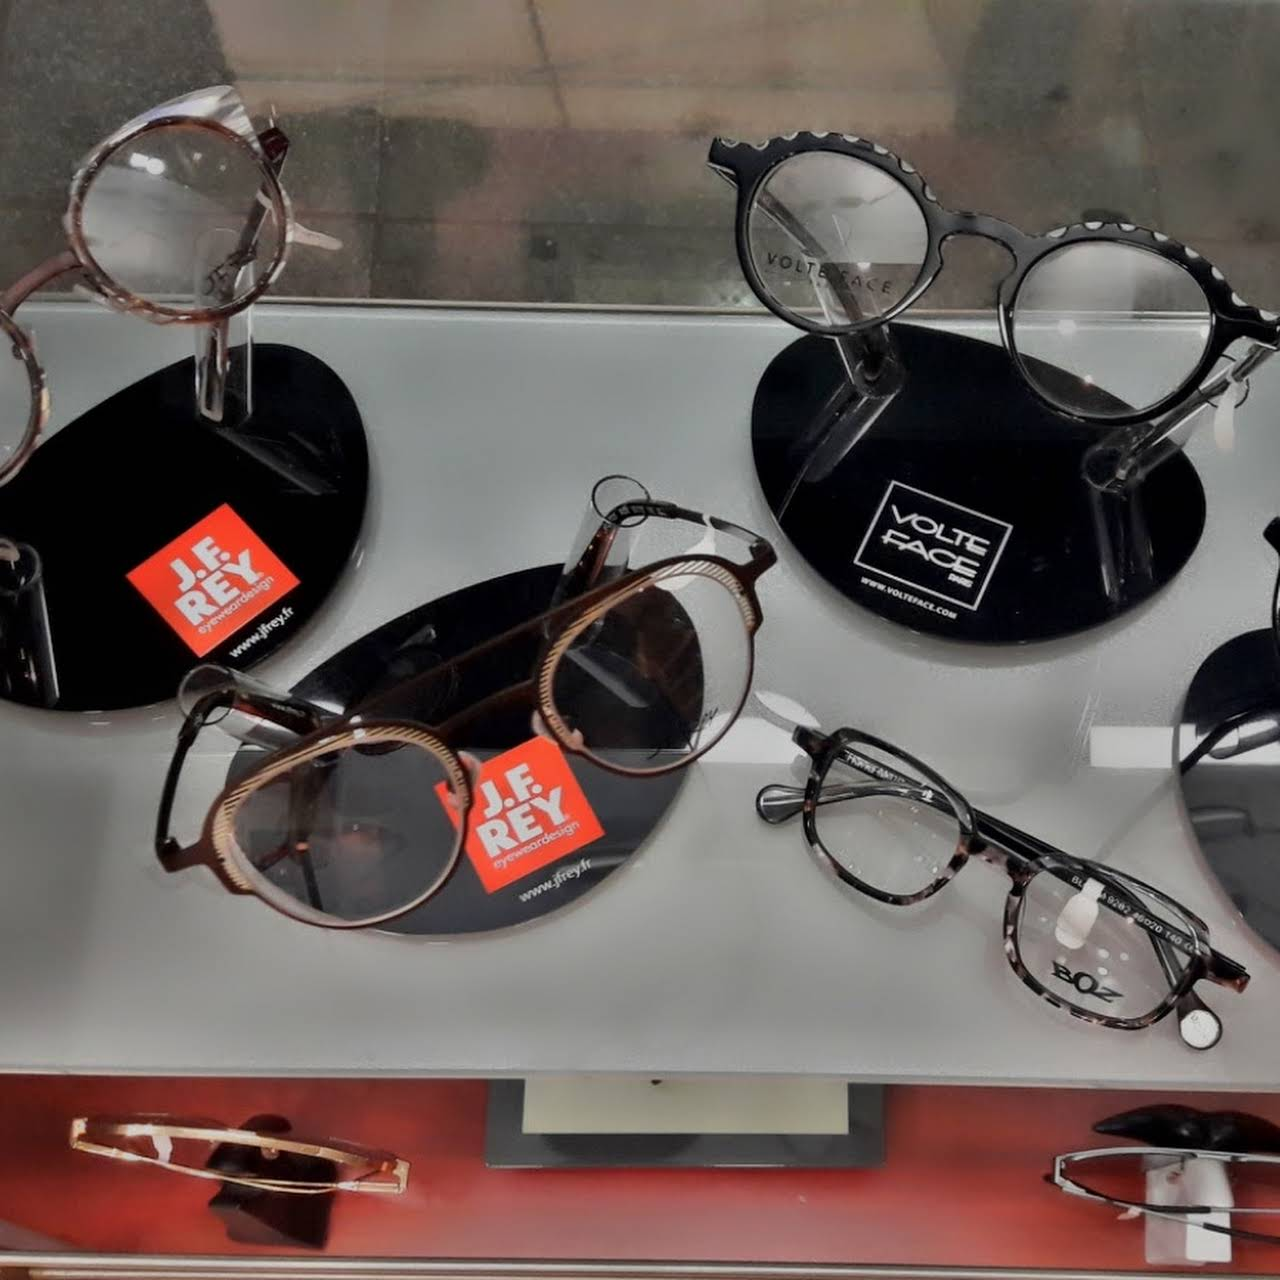 f596e59d44 Οπτικά Ασούτης - Βασιλείου - ΟΠΤΙΚΑ - ΦΑΚΟΙ ΕΠΑΦΗΣ eye protection